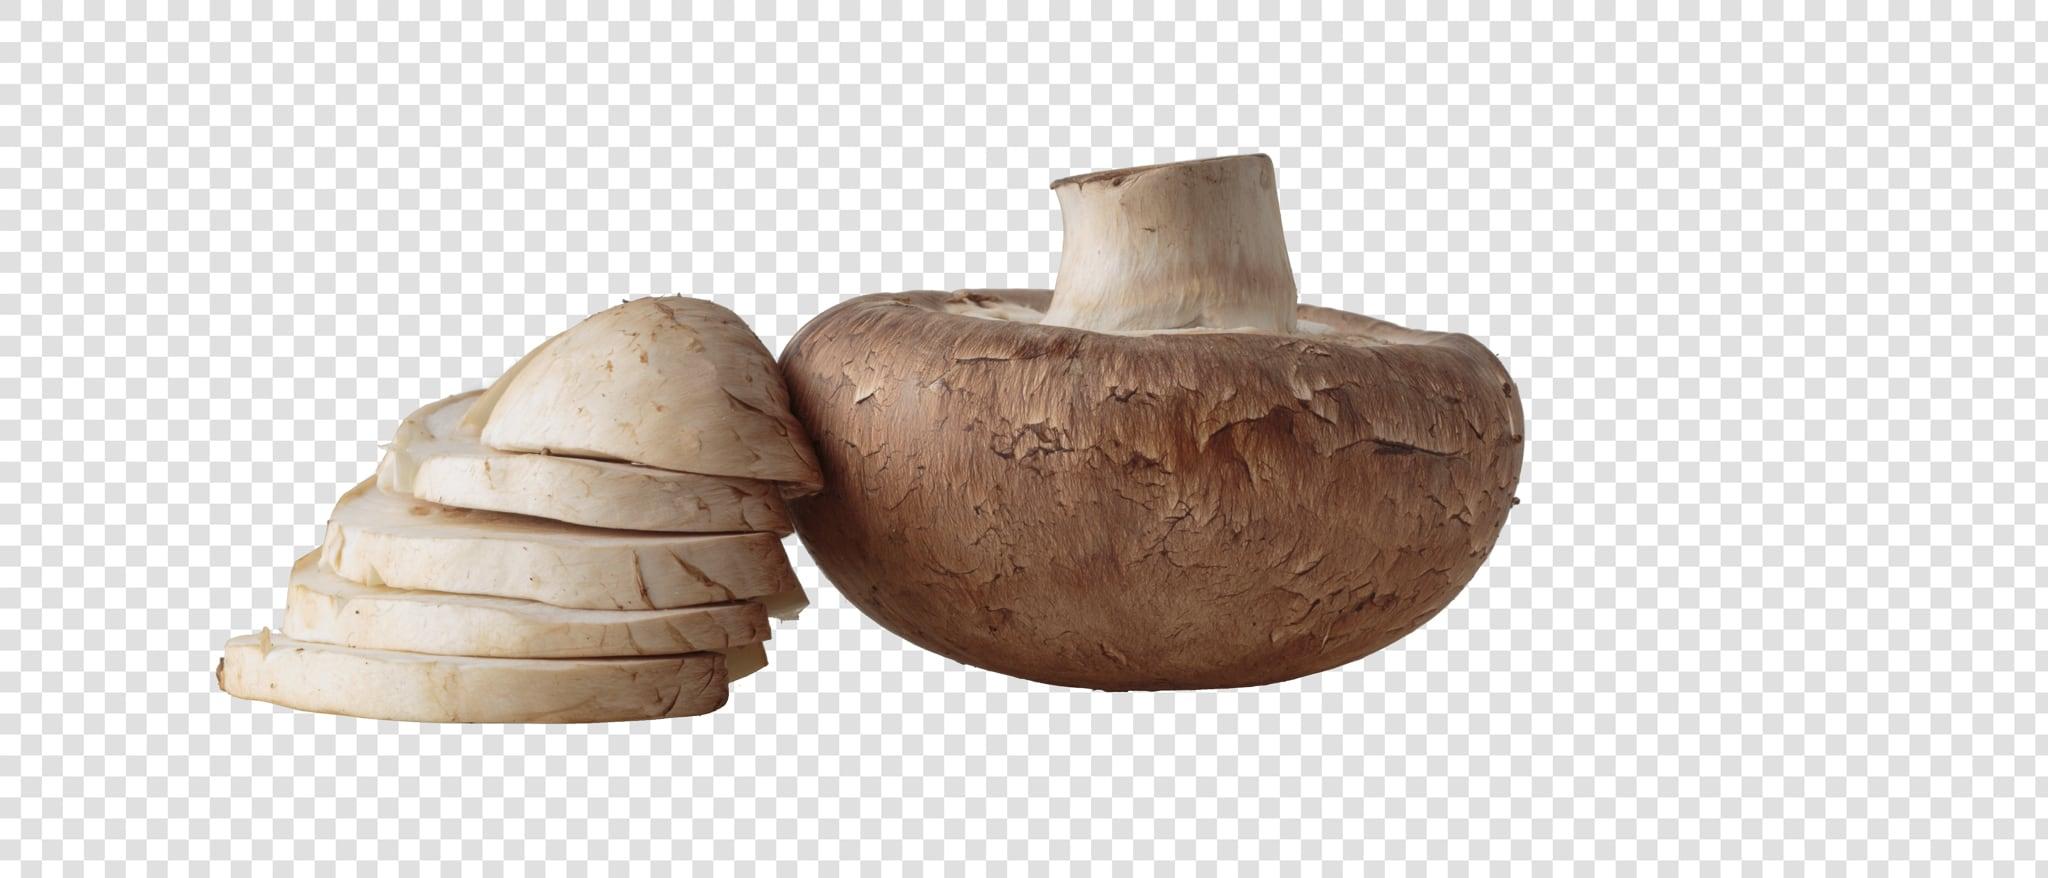 Champignon PSD isolated image